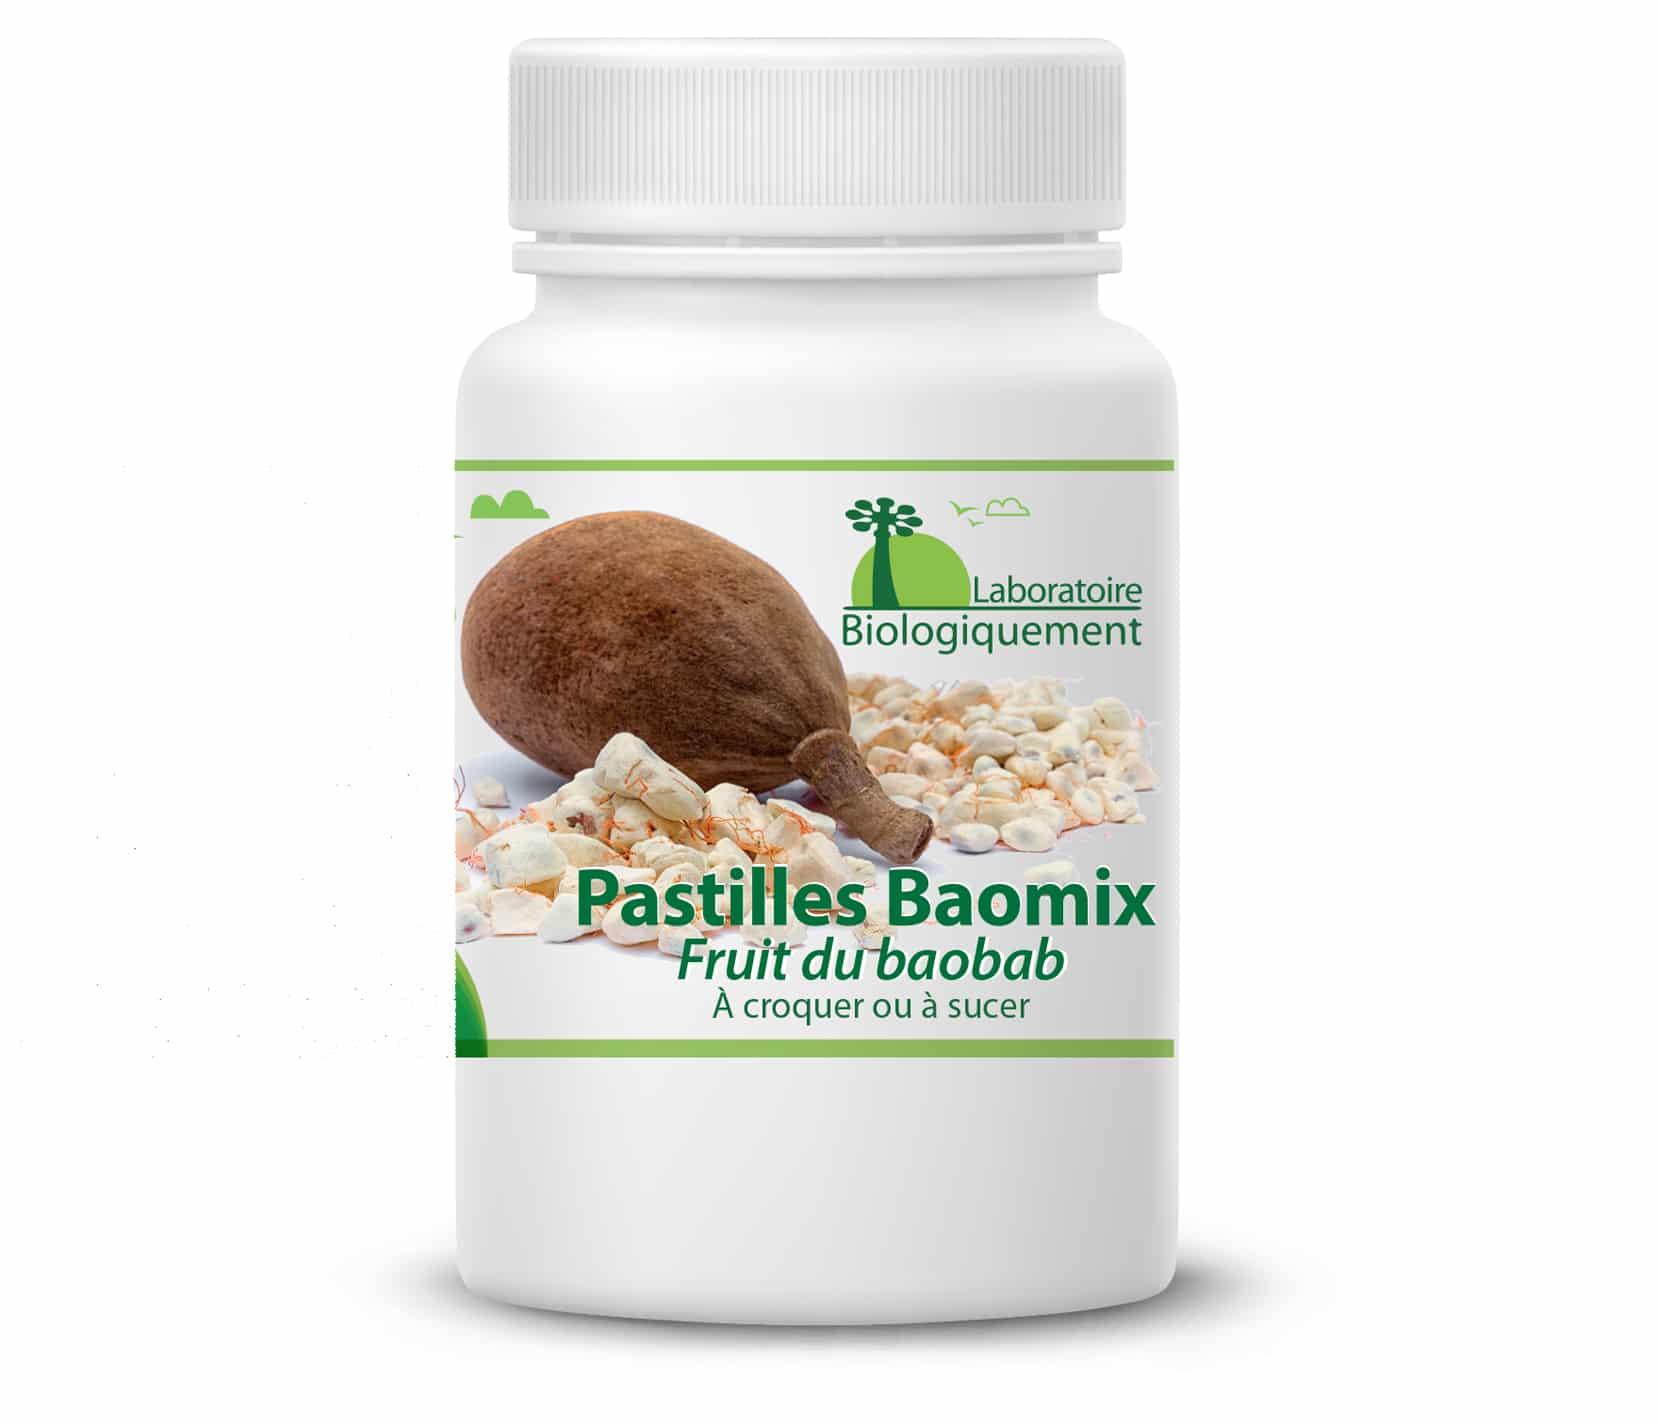 Pastilles de fruit de baobab bio Baomix